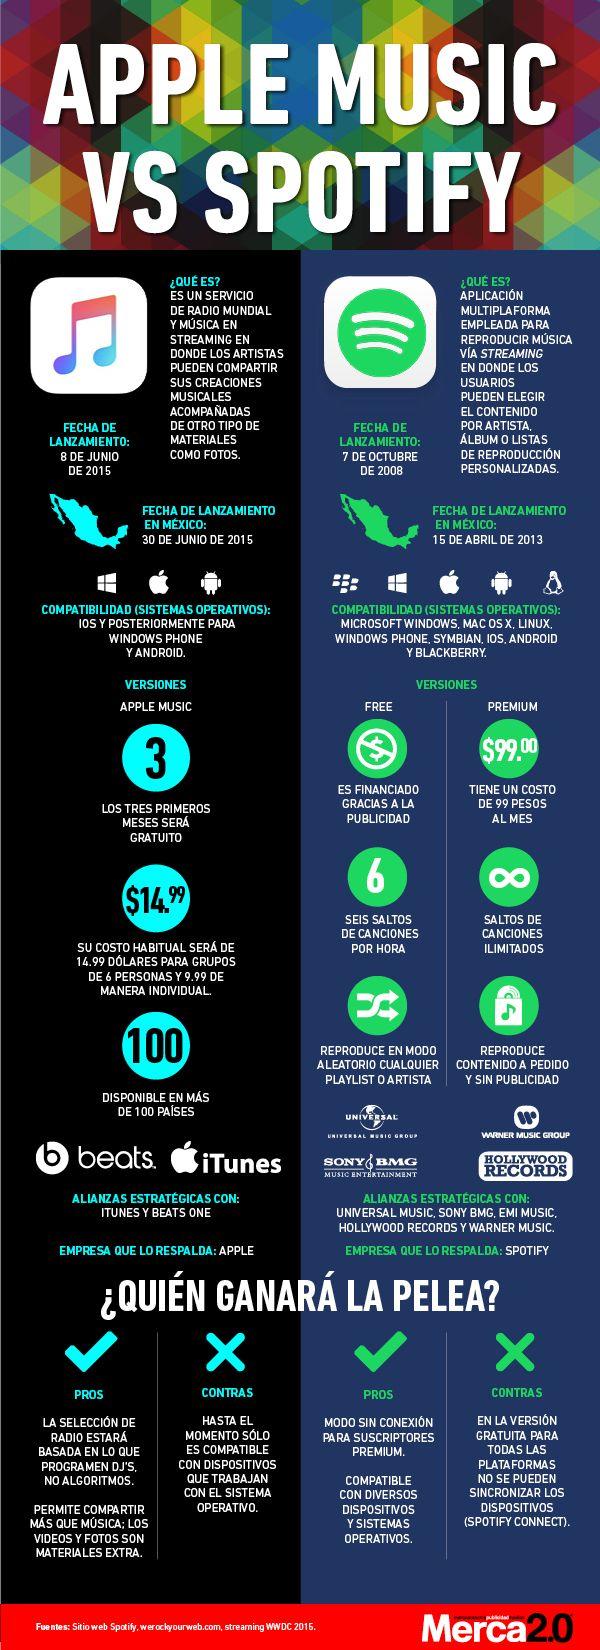 Infográfico compara Apple Music e Spotify | Dj | Apple music